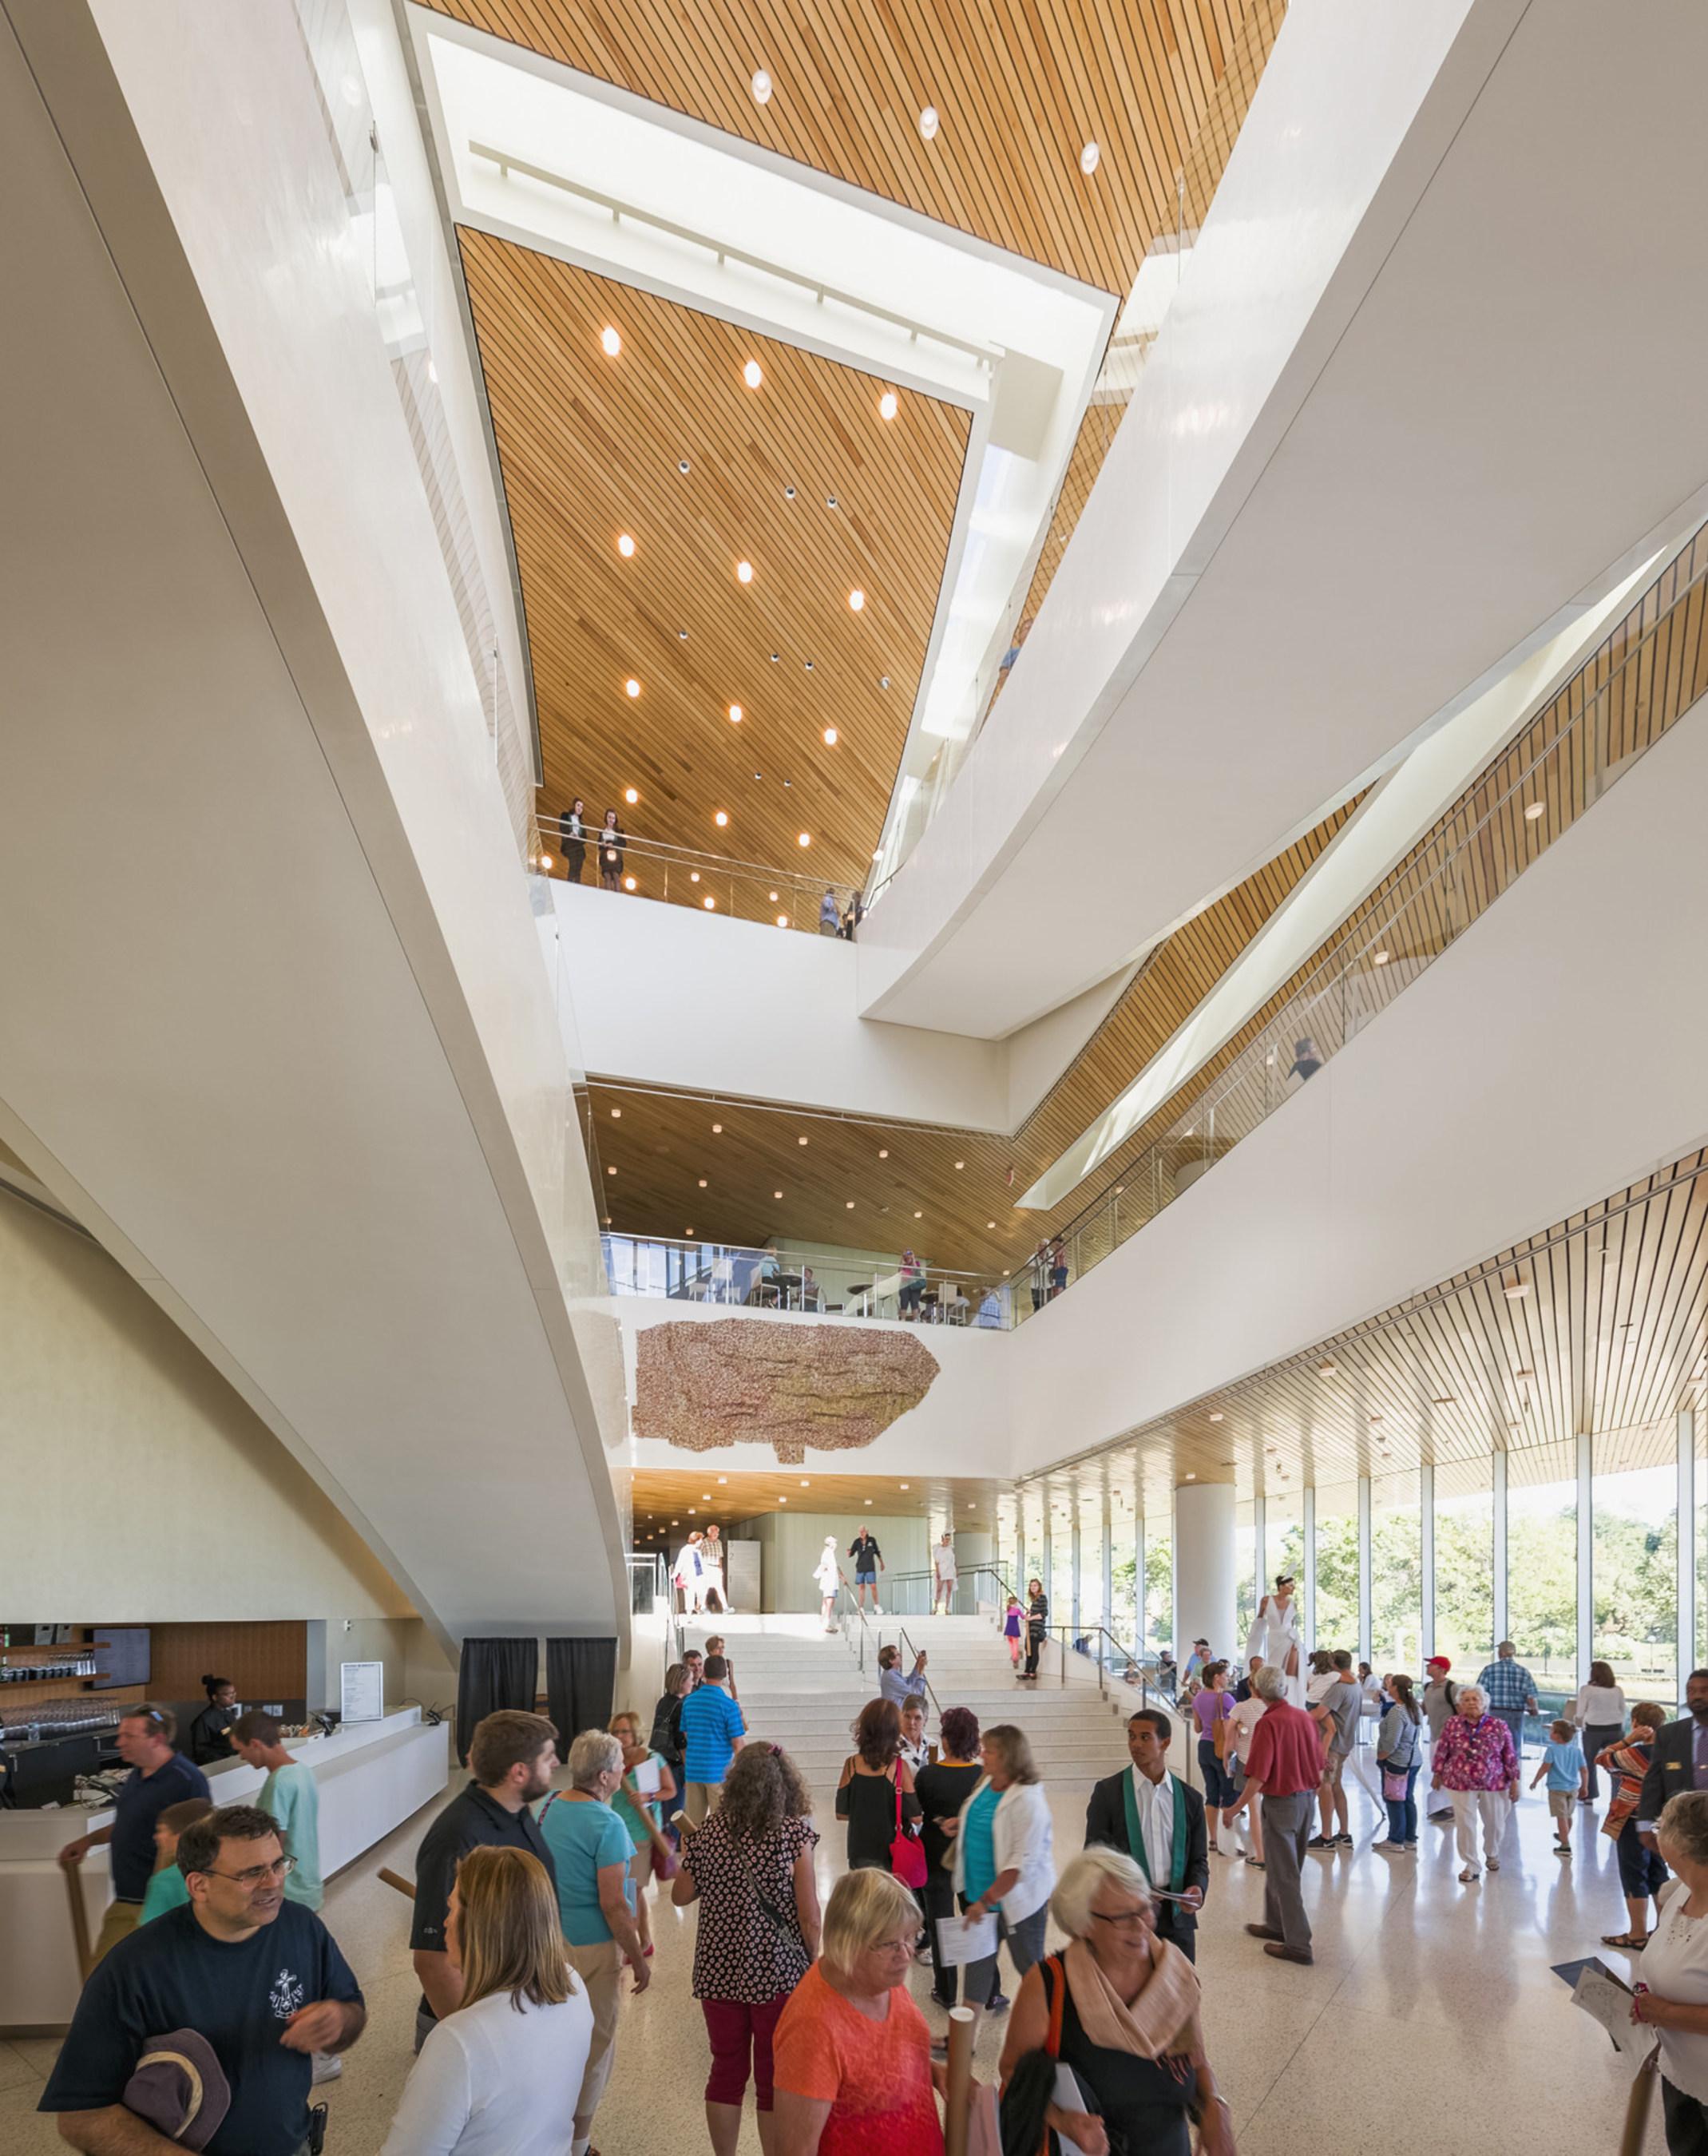 Lobby, Hancher Auditorium, University of Iowa, photo by Jeff Goldberg/Esto